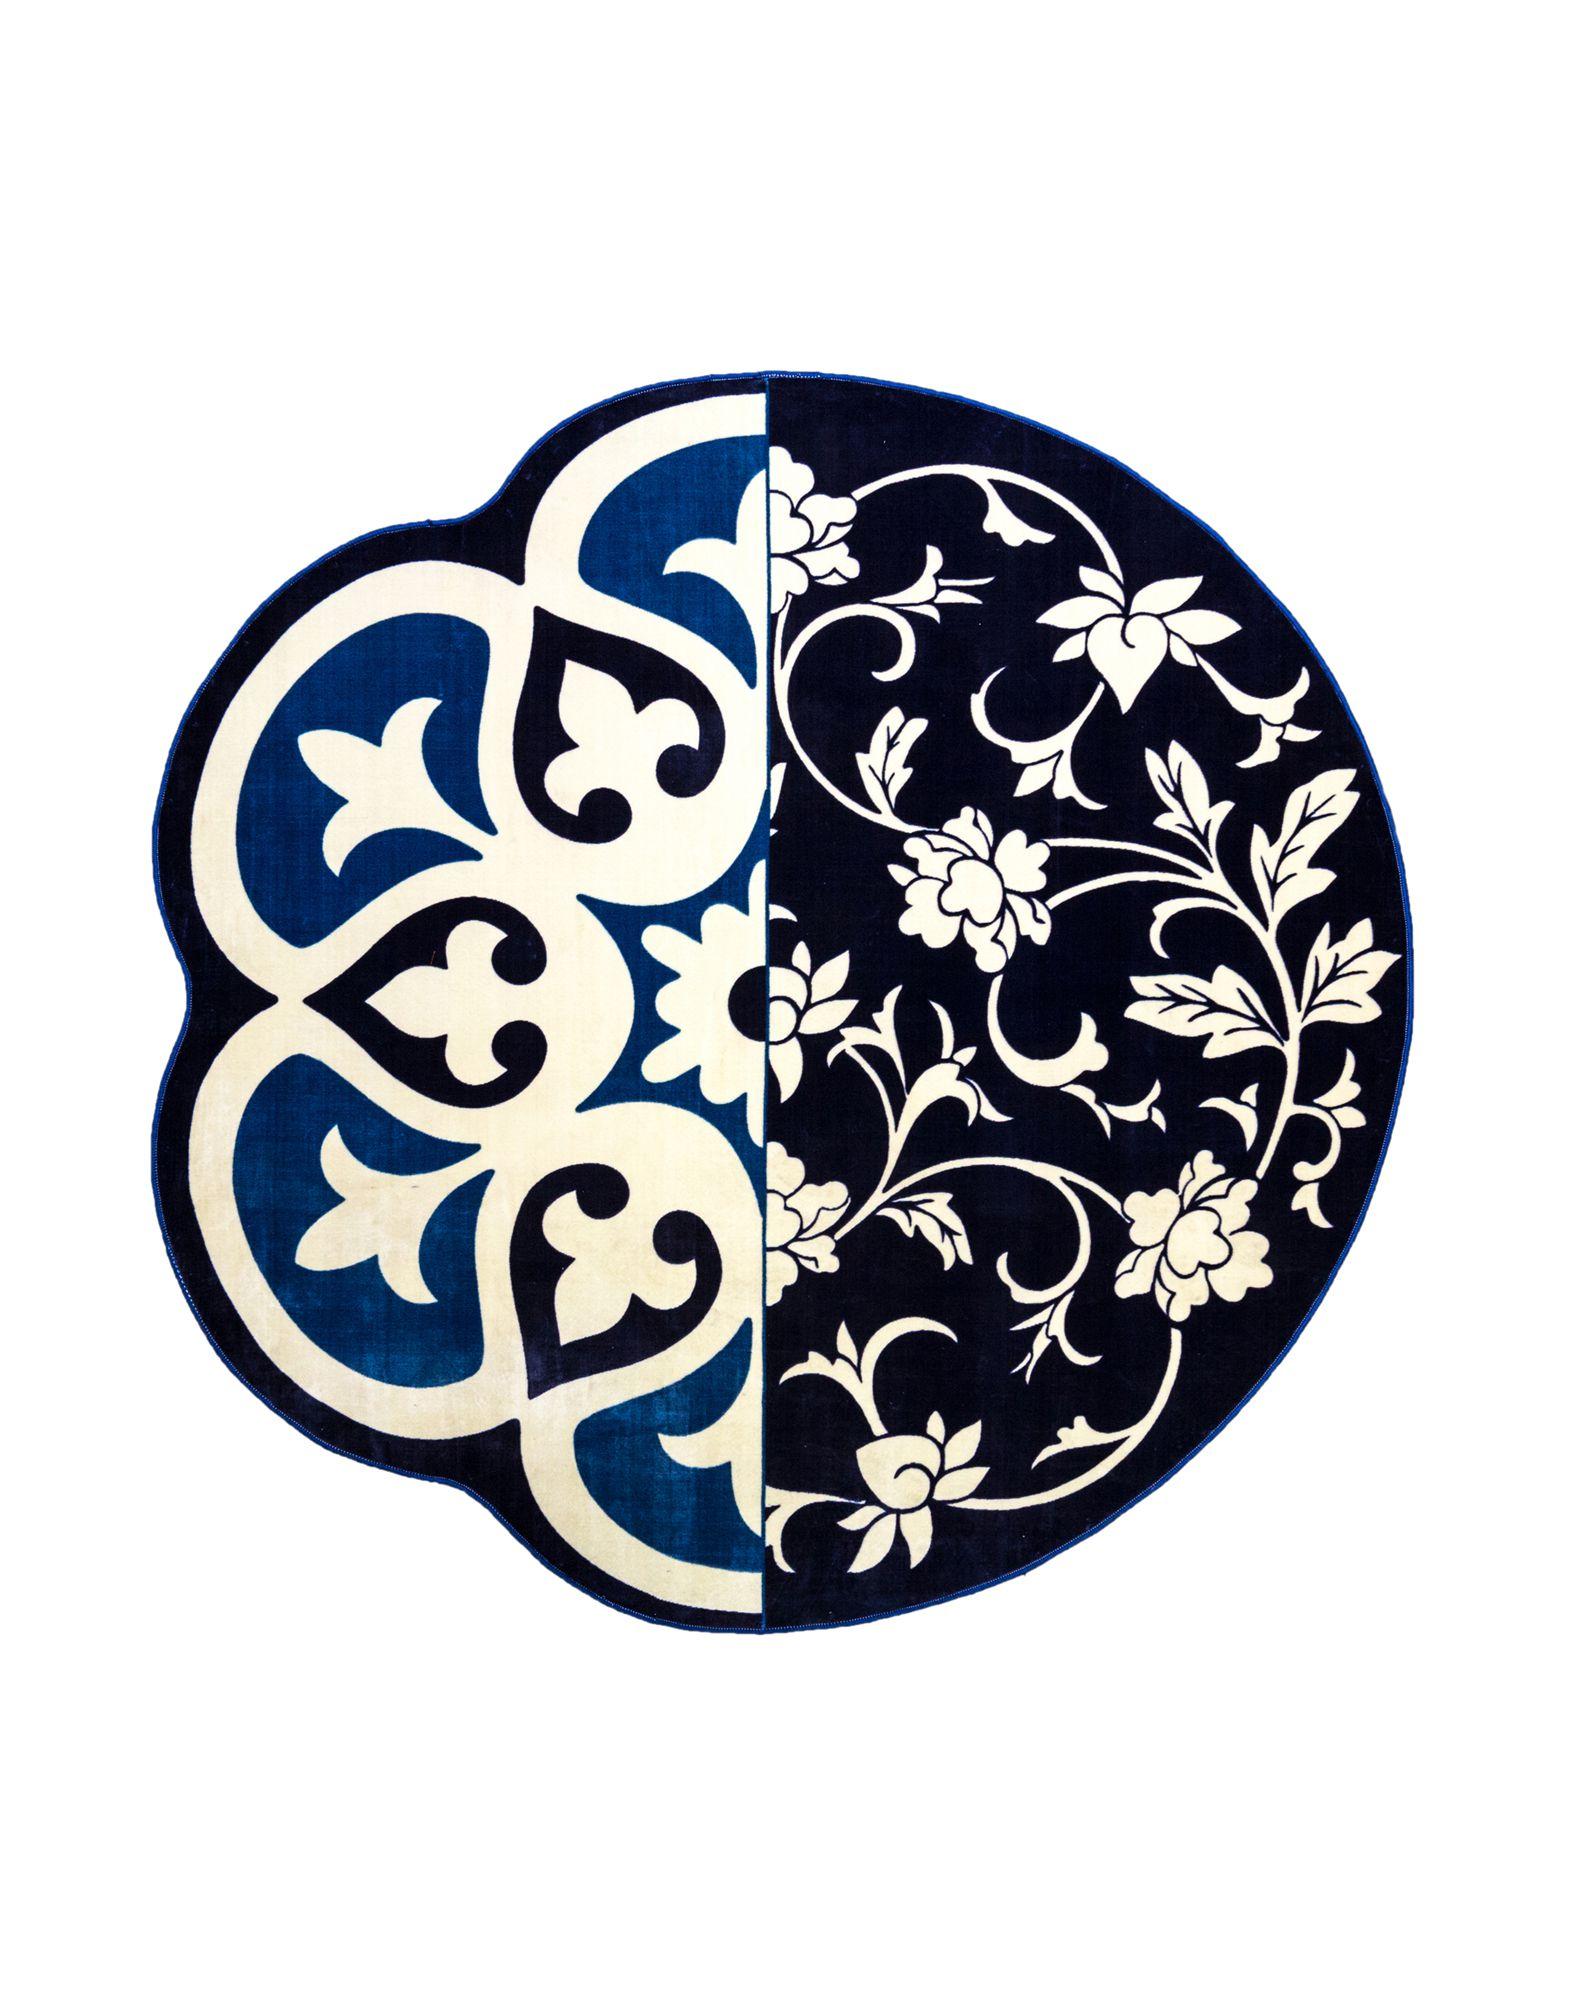 SELETTI Unisex Teppich Farbe Blau Größe 1